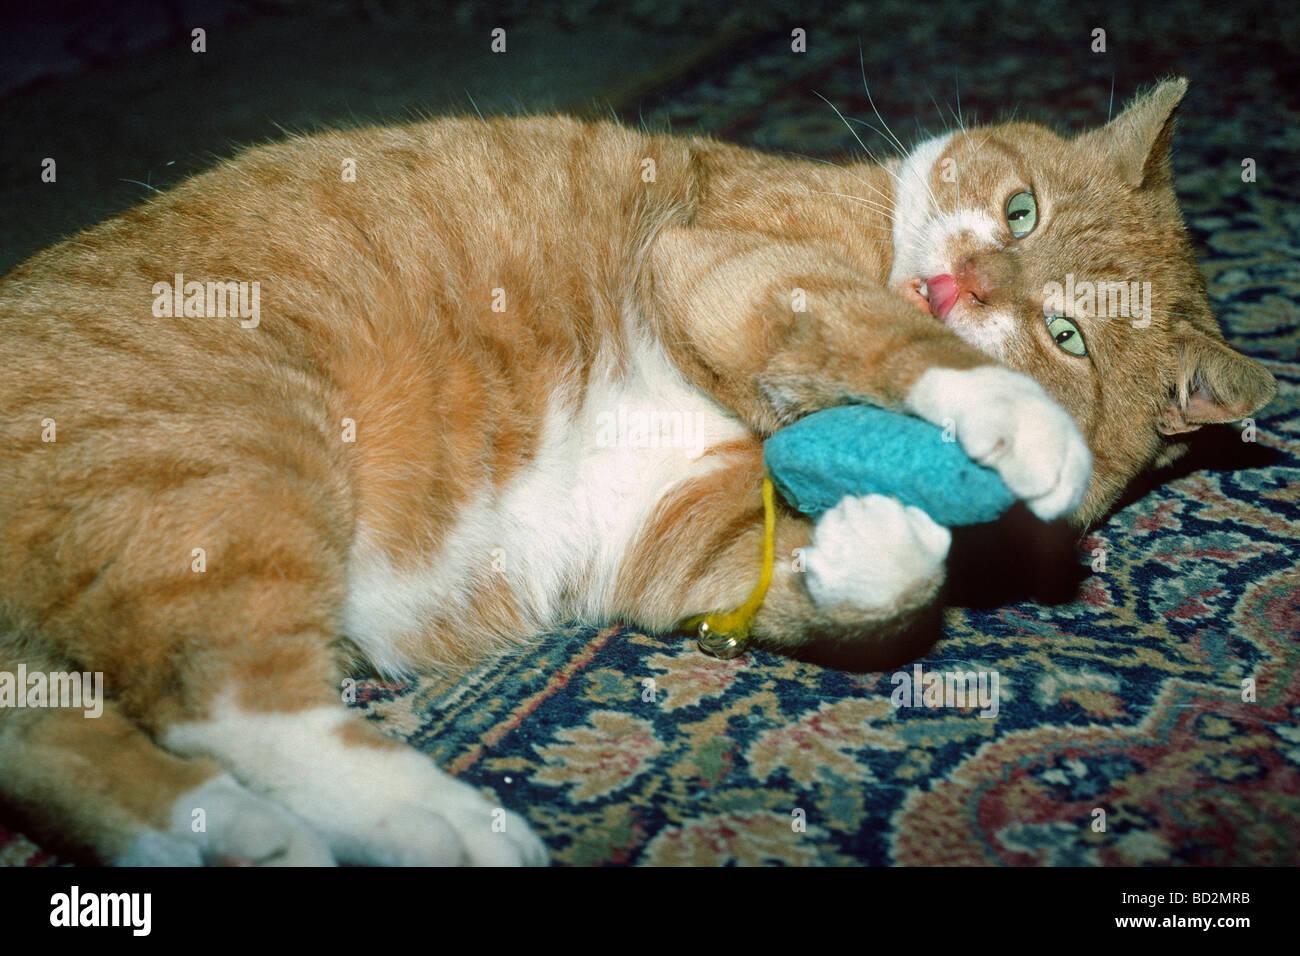 Jengibre Gato jugando con un juguete Foto de stock